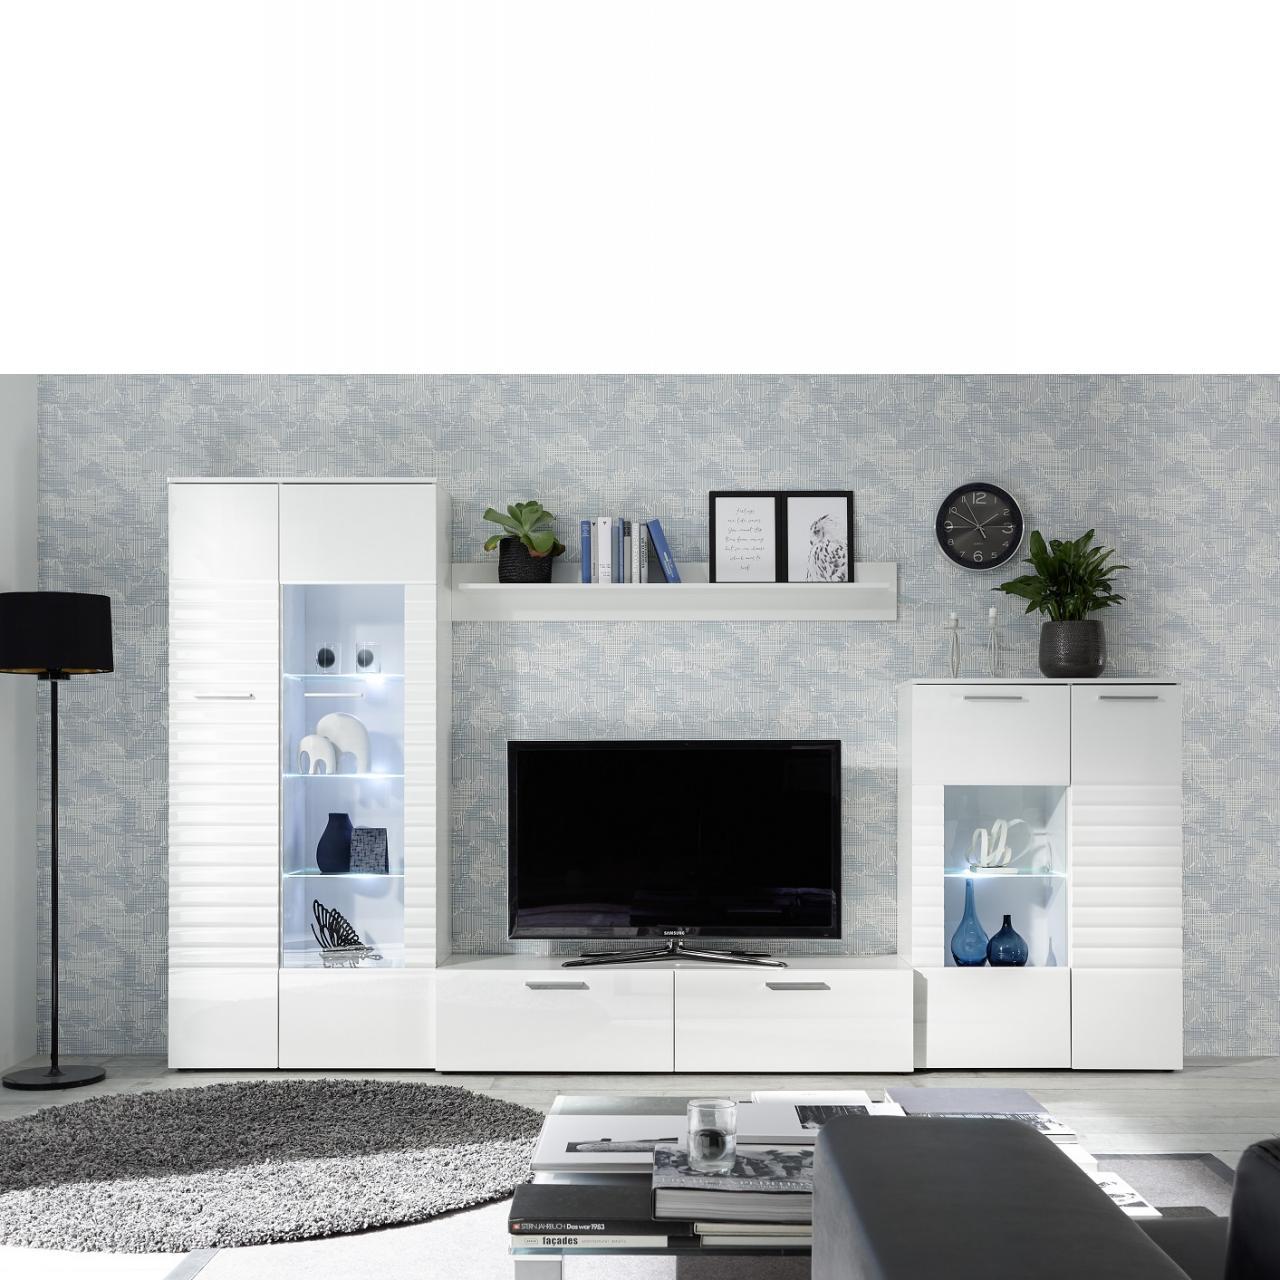 Wohnwand New Long Weiß/Weiß Hochglanz 4-teilig inkl. LED-Beleuchtung Anbauwand